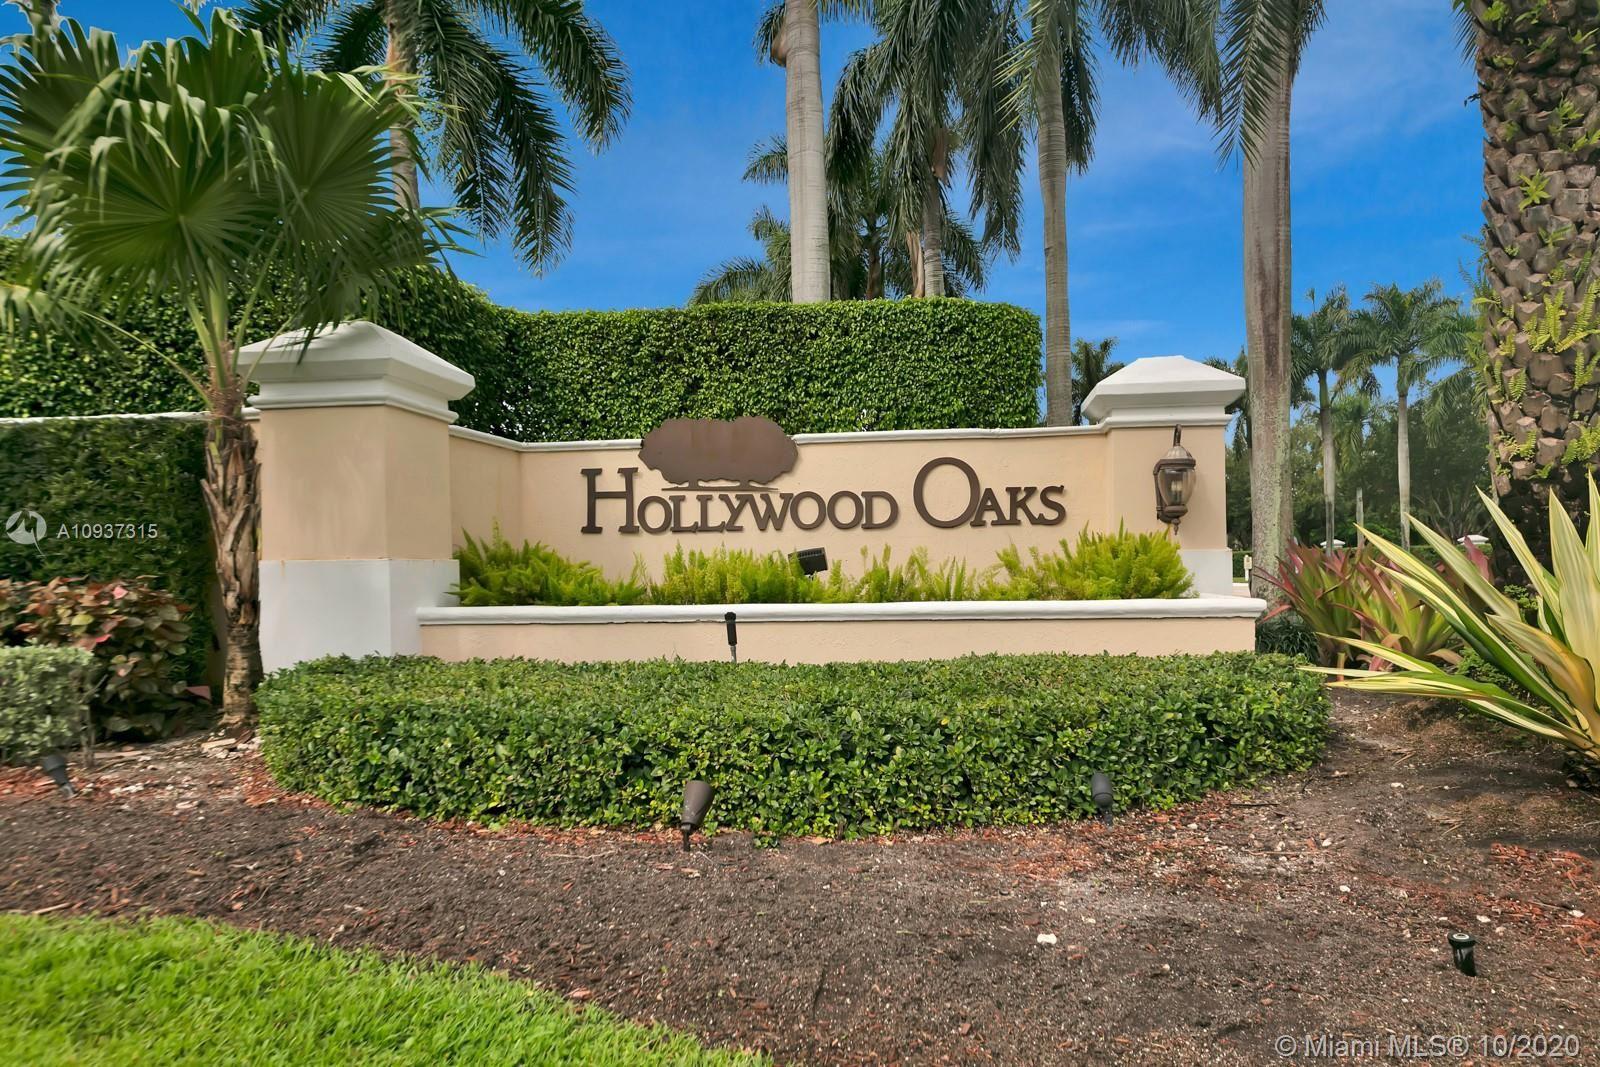 3624 Estate Oak Cir, Hollywood, FL 33312 - #: A10937315